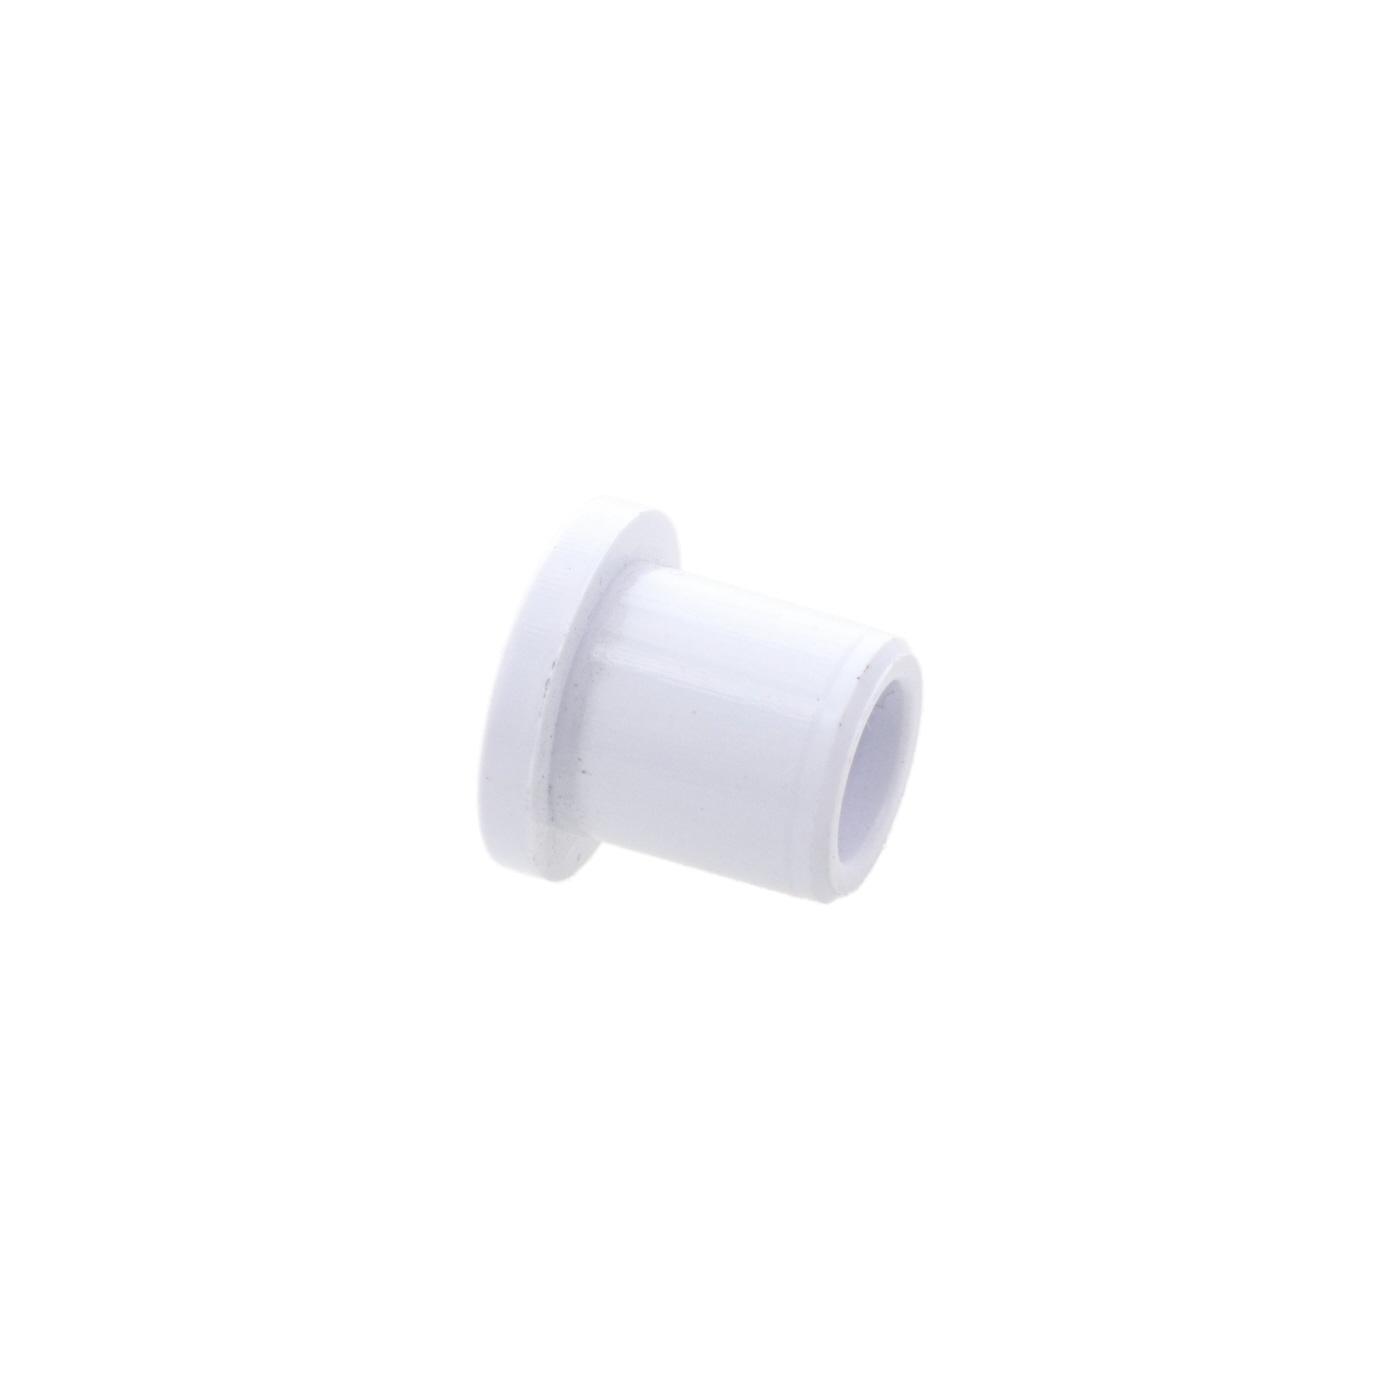 ¾'' M Pipe / Manifold Cap